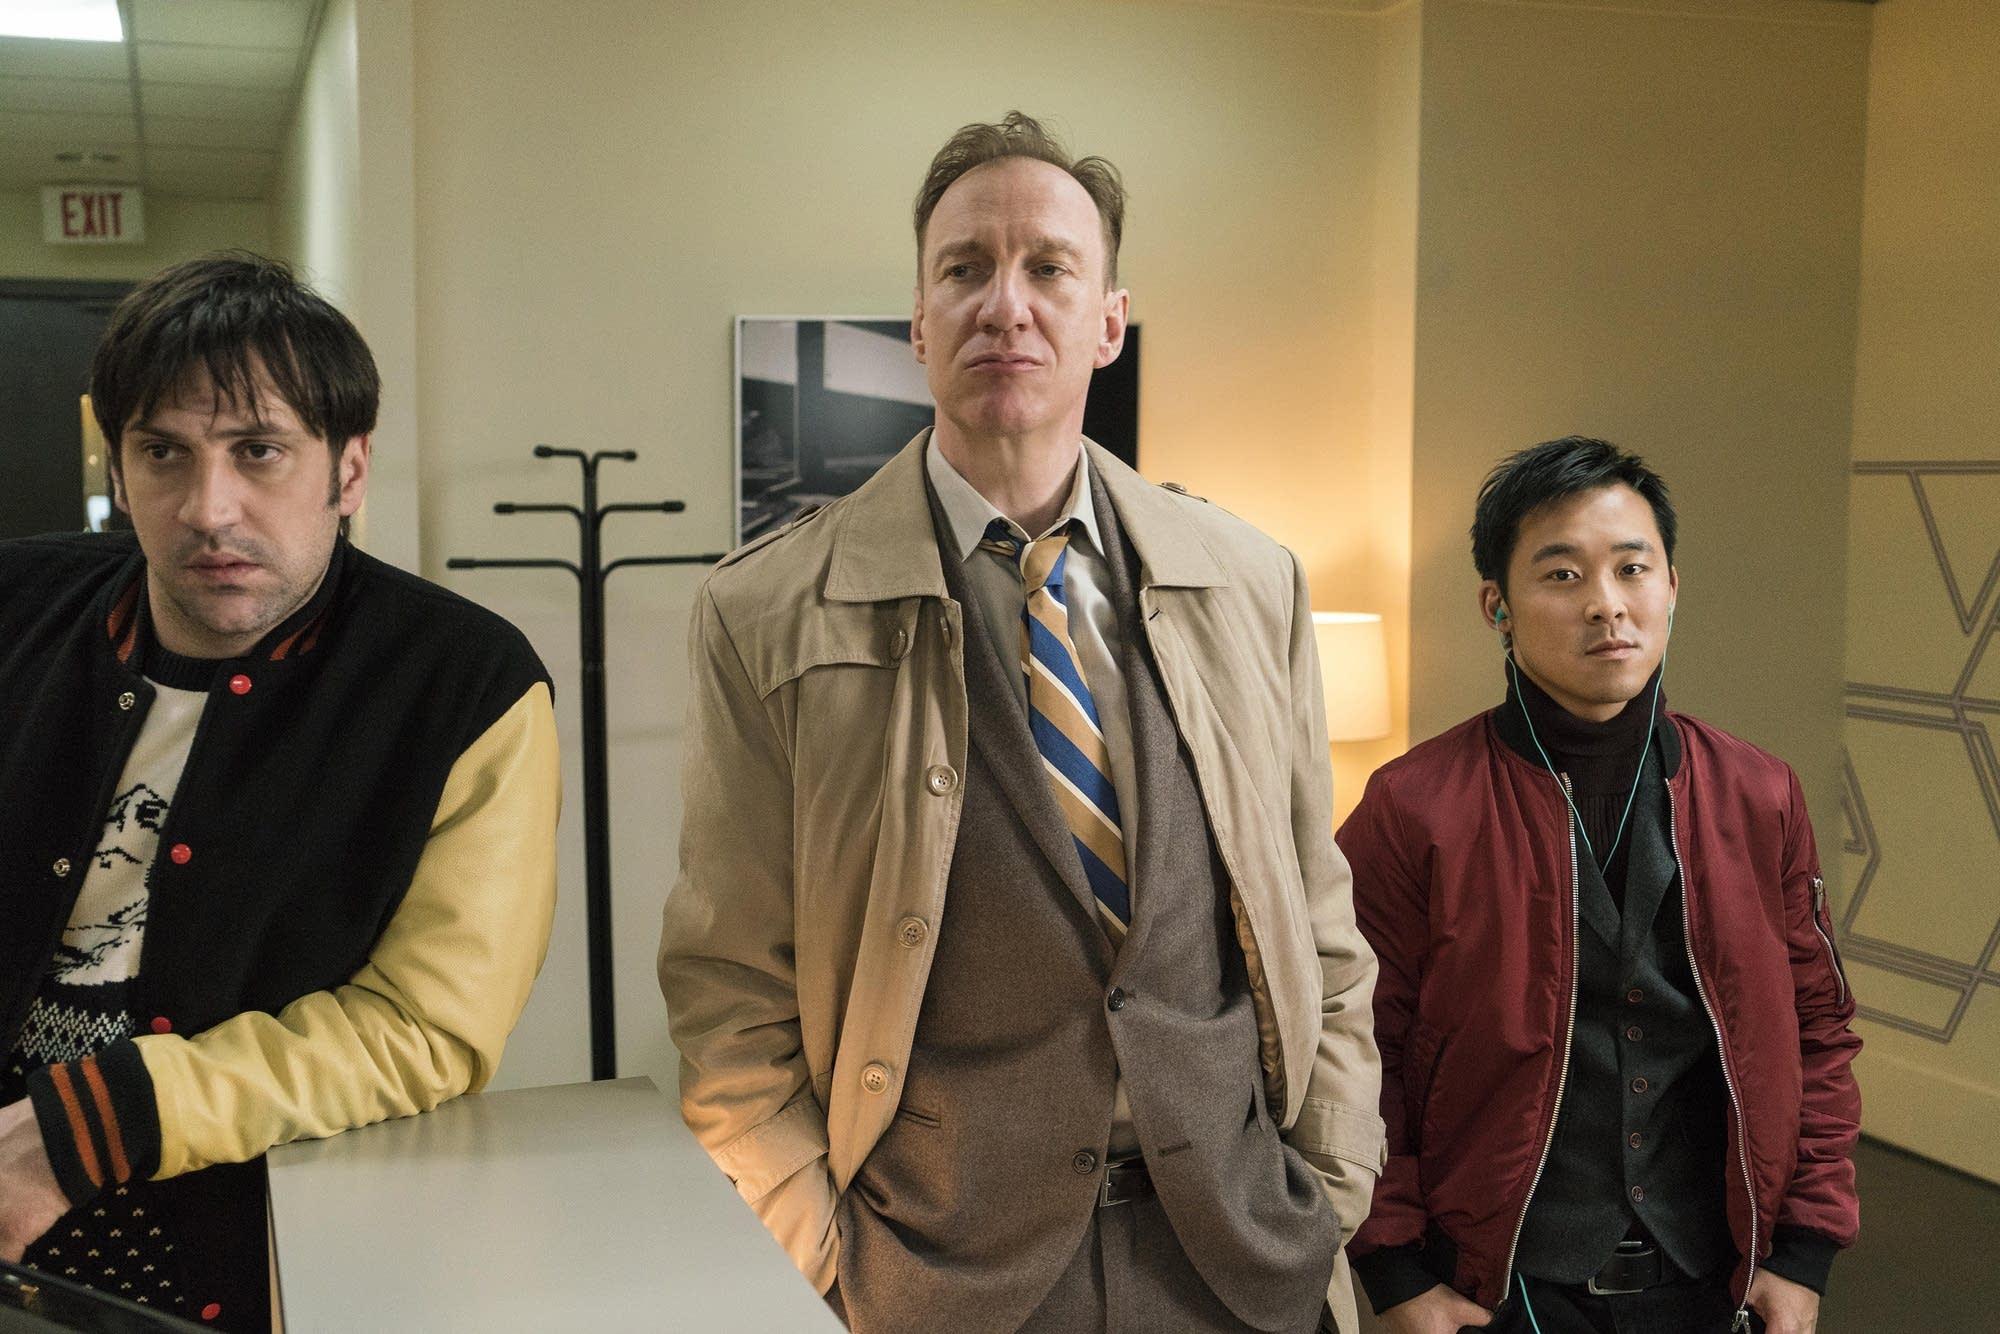 Goran Bogdan as Yuri Gurka, David Thewlis as V.M. Vargas, Andy Yu as Meemo